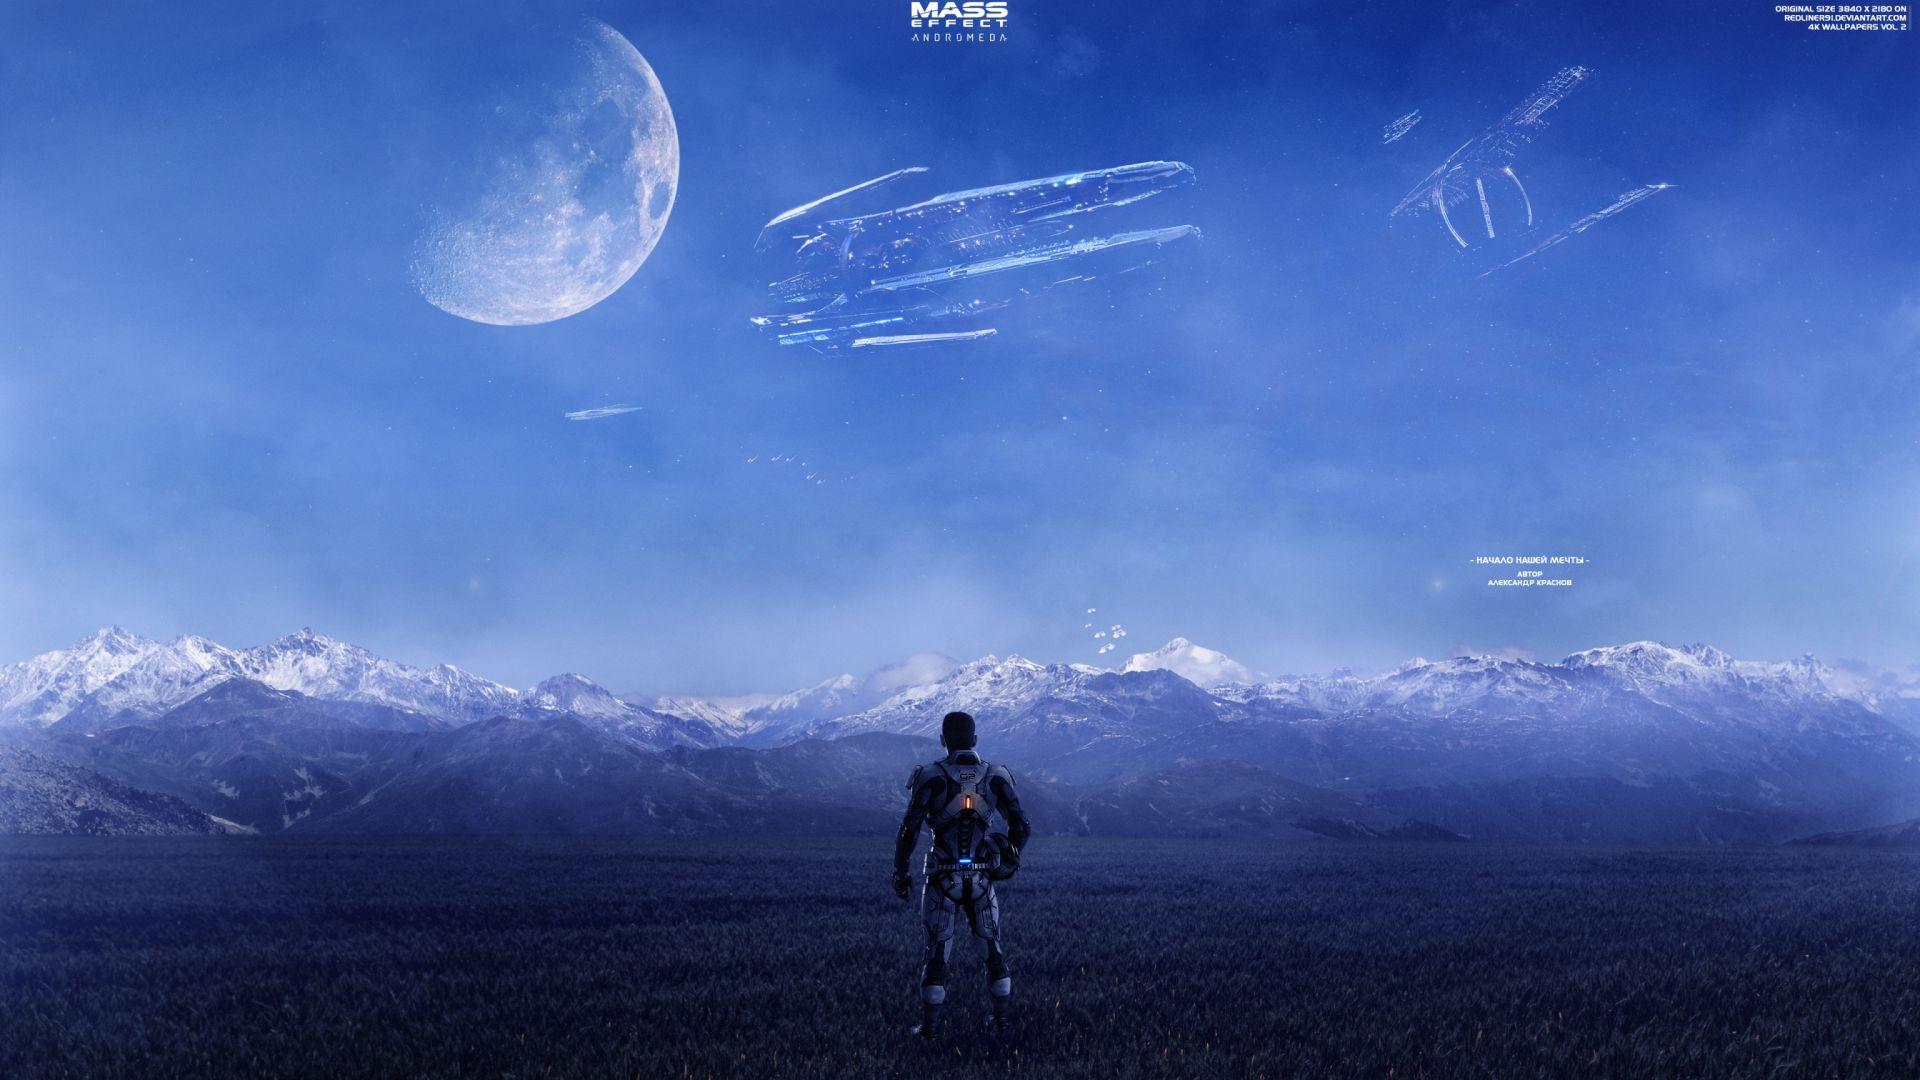 Mass Effect Andromeda Wallpaper Iphone: Desktop Wallpaper Mass Effect: Andromeda, Space, Planet